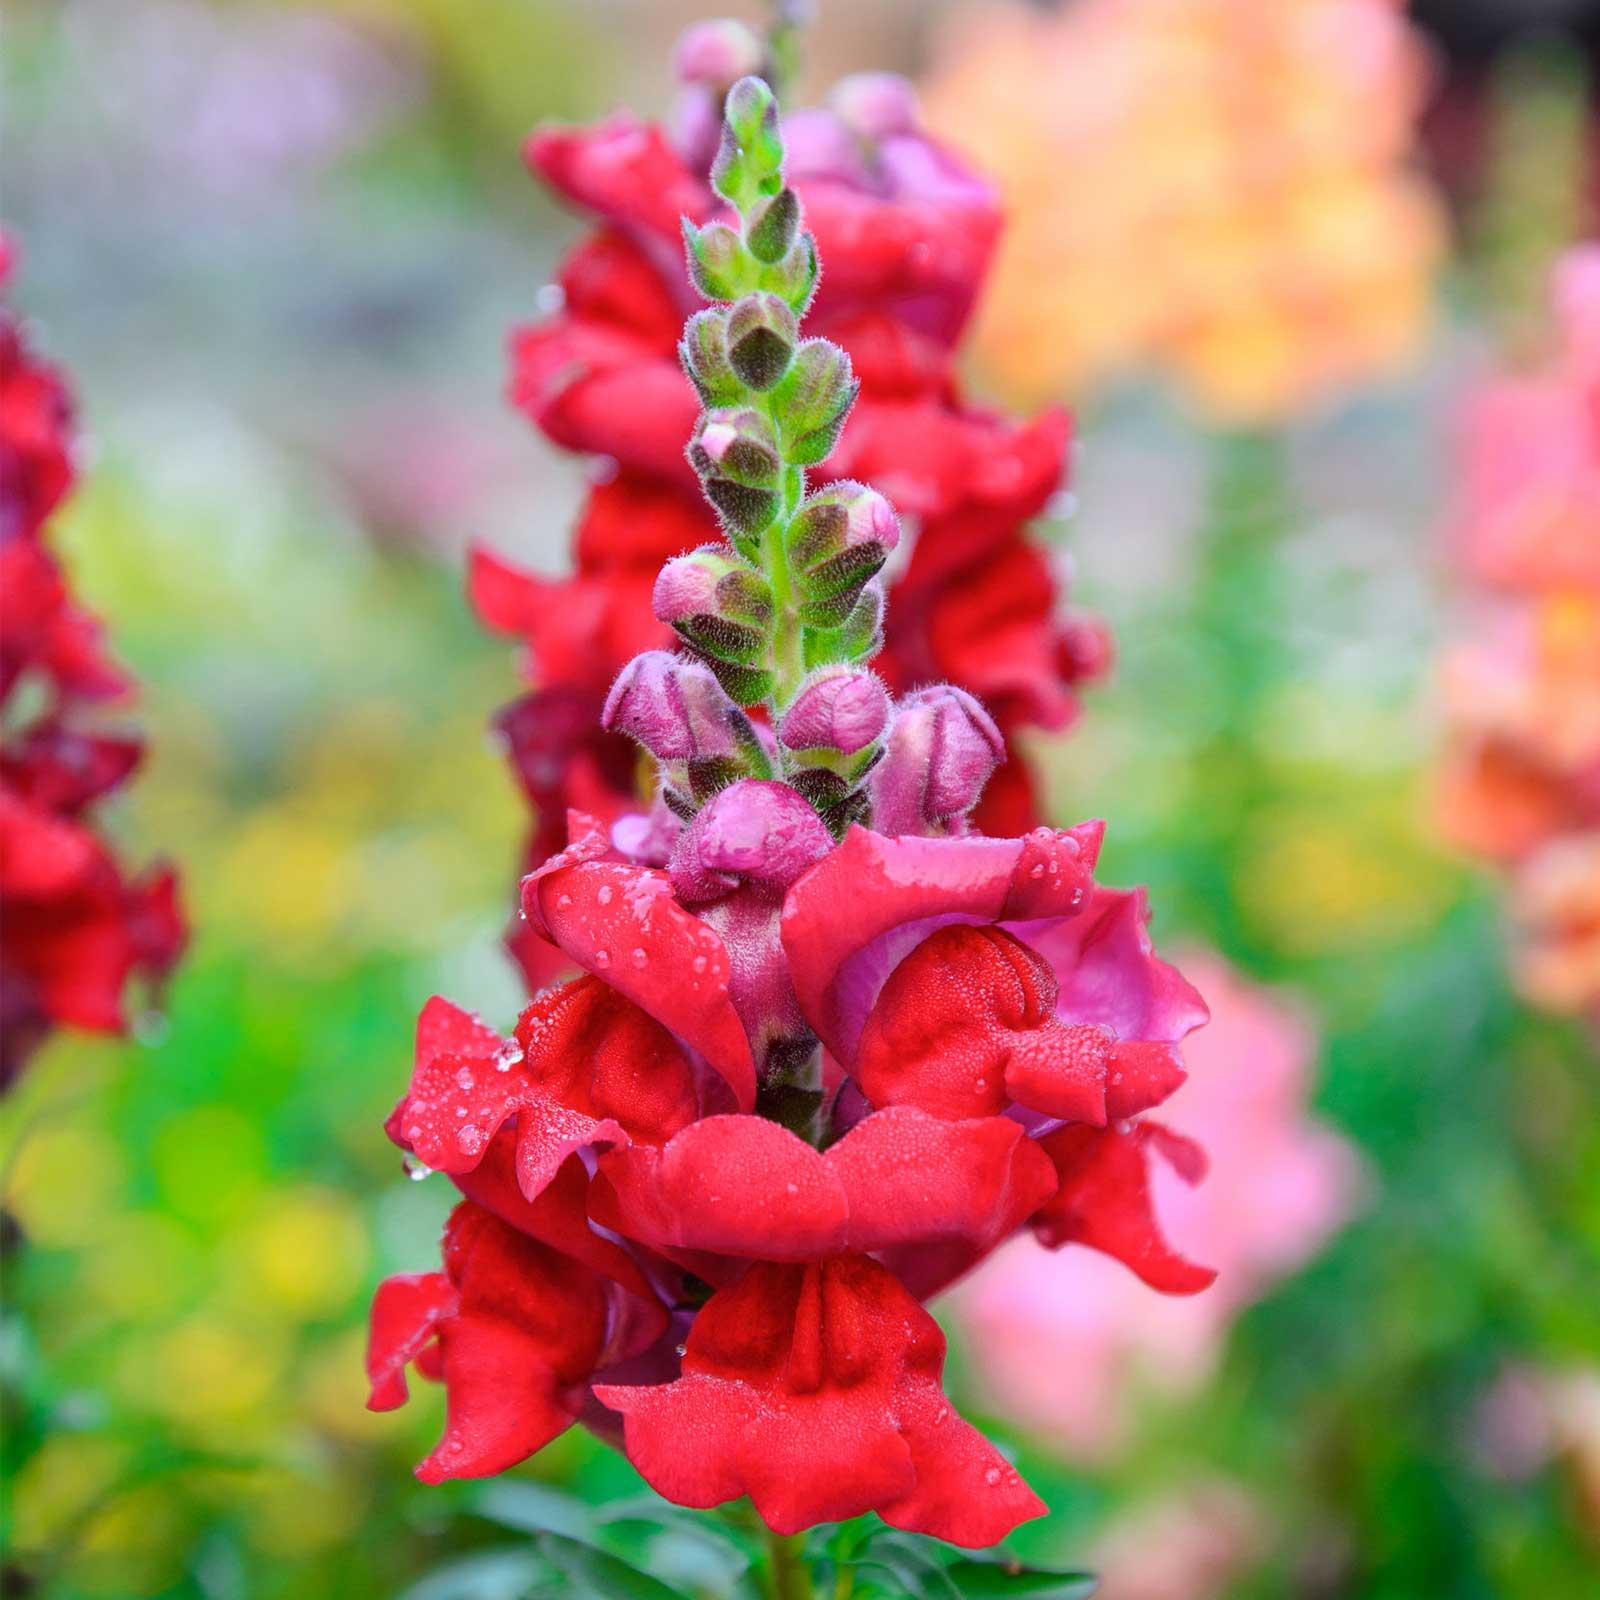 Snapdragon Flower Seeds Sonnet Series F1 Carmine Annual Garden